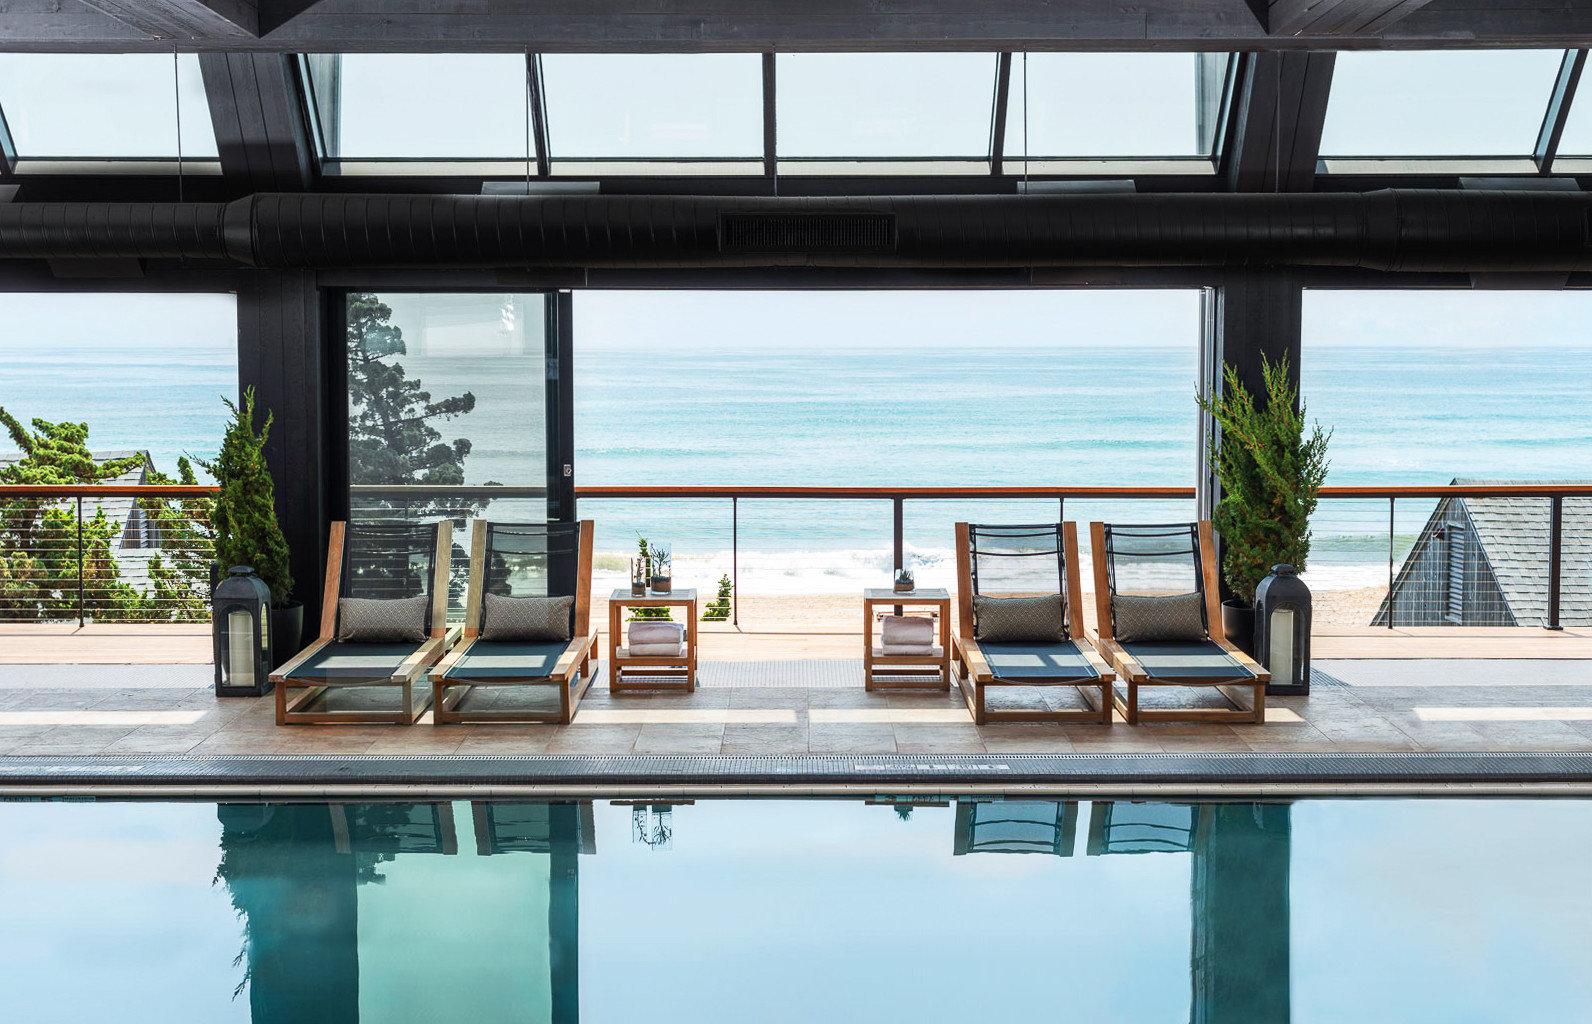 Hotels Ocean Pool Resort Trip Ideas property building swimming pool house Architecture home condominium